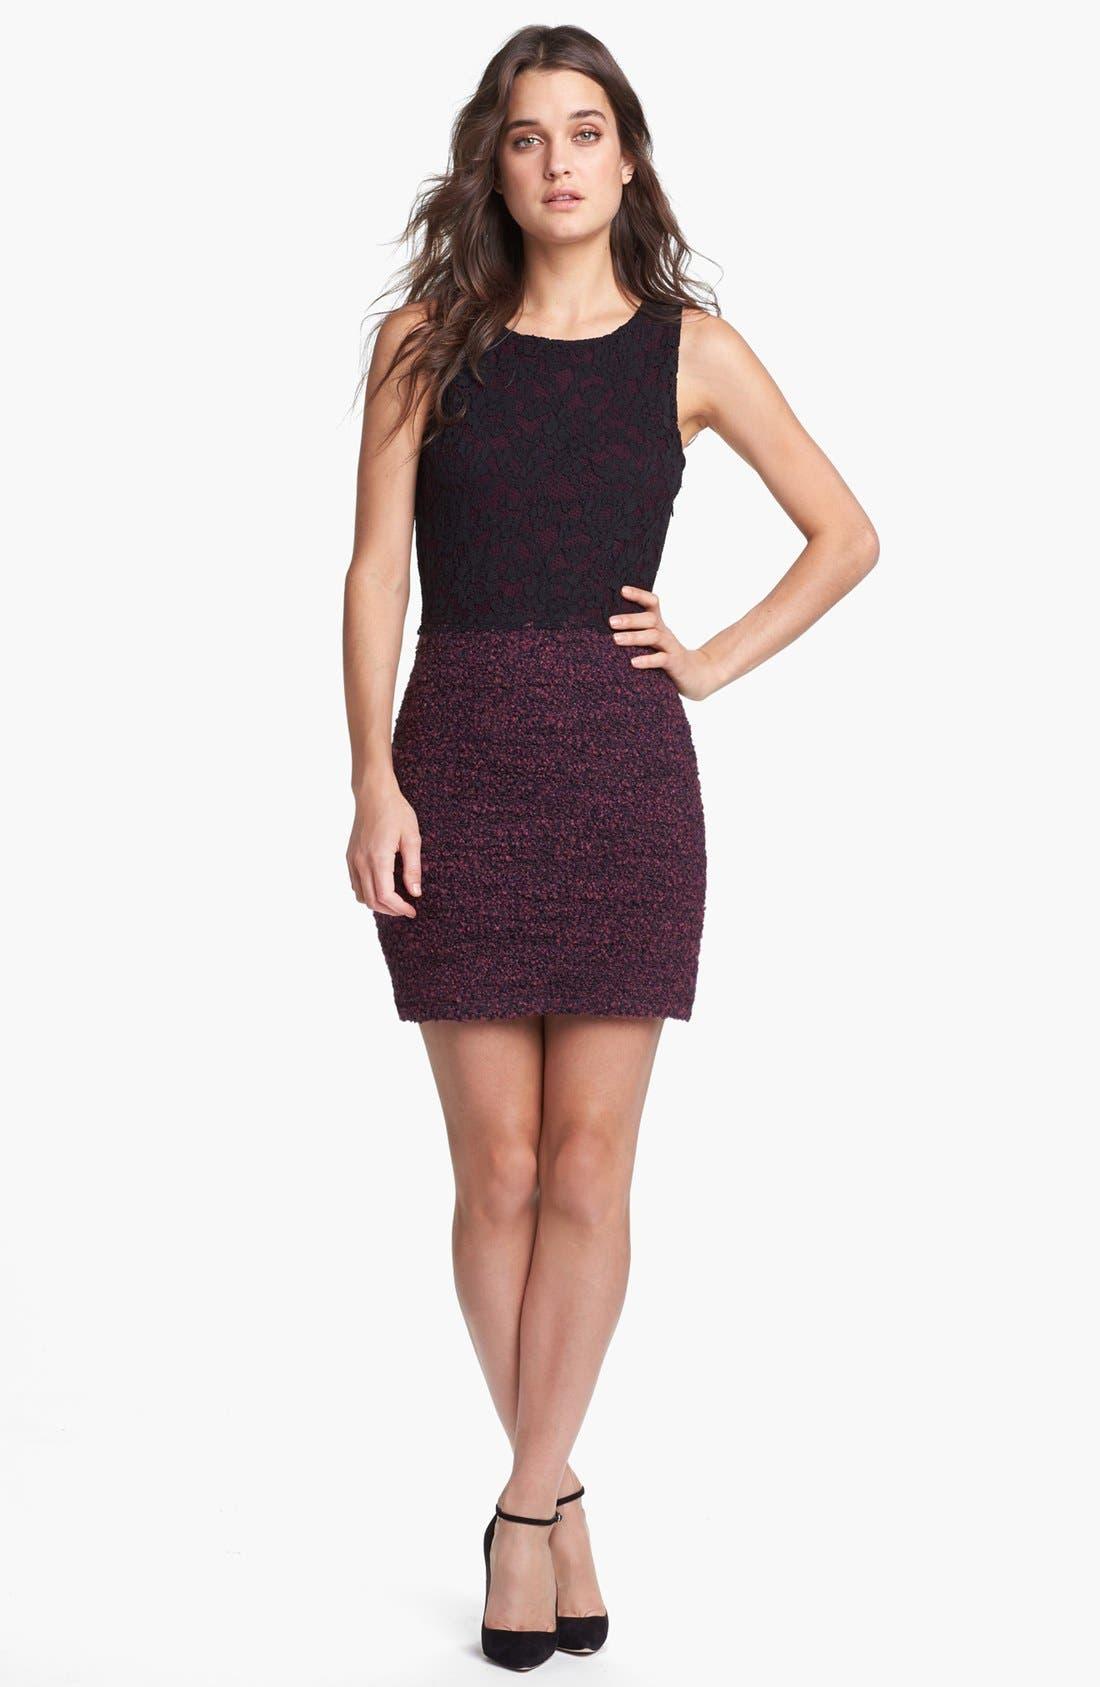 Alternate Image 1 Selected - Bailey 44 'Enshadowed Heart' Lace & Bouclé Dress